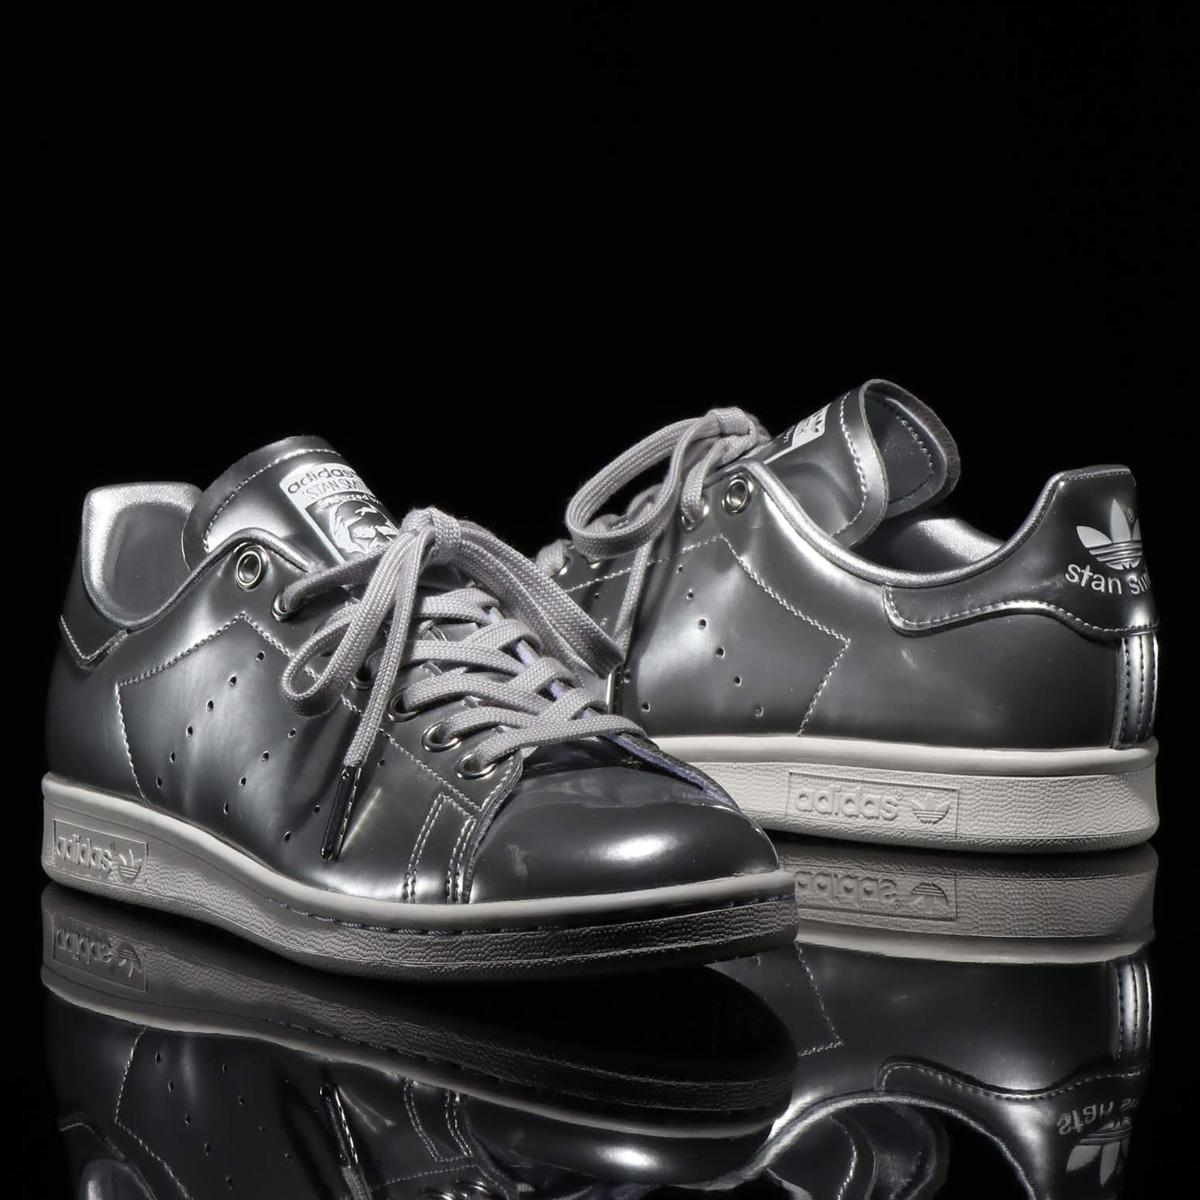 adidas STAN SMITH(アディダス スタンスミス)SILVER MET/SILVER MET/CRYSTAL WHITE【メンズ レディース スニーカー】19FW-I